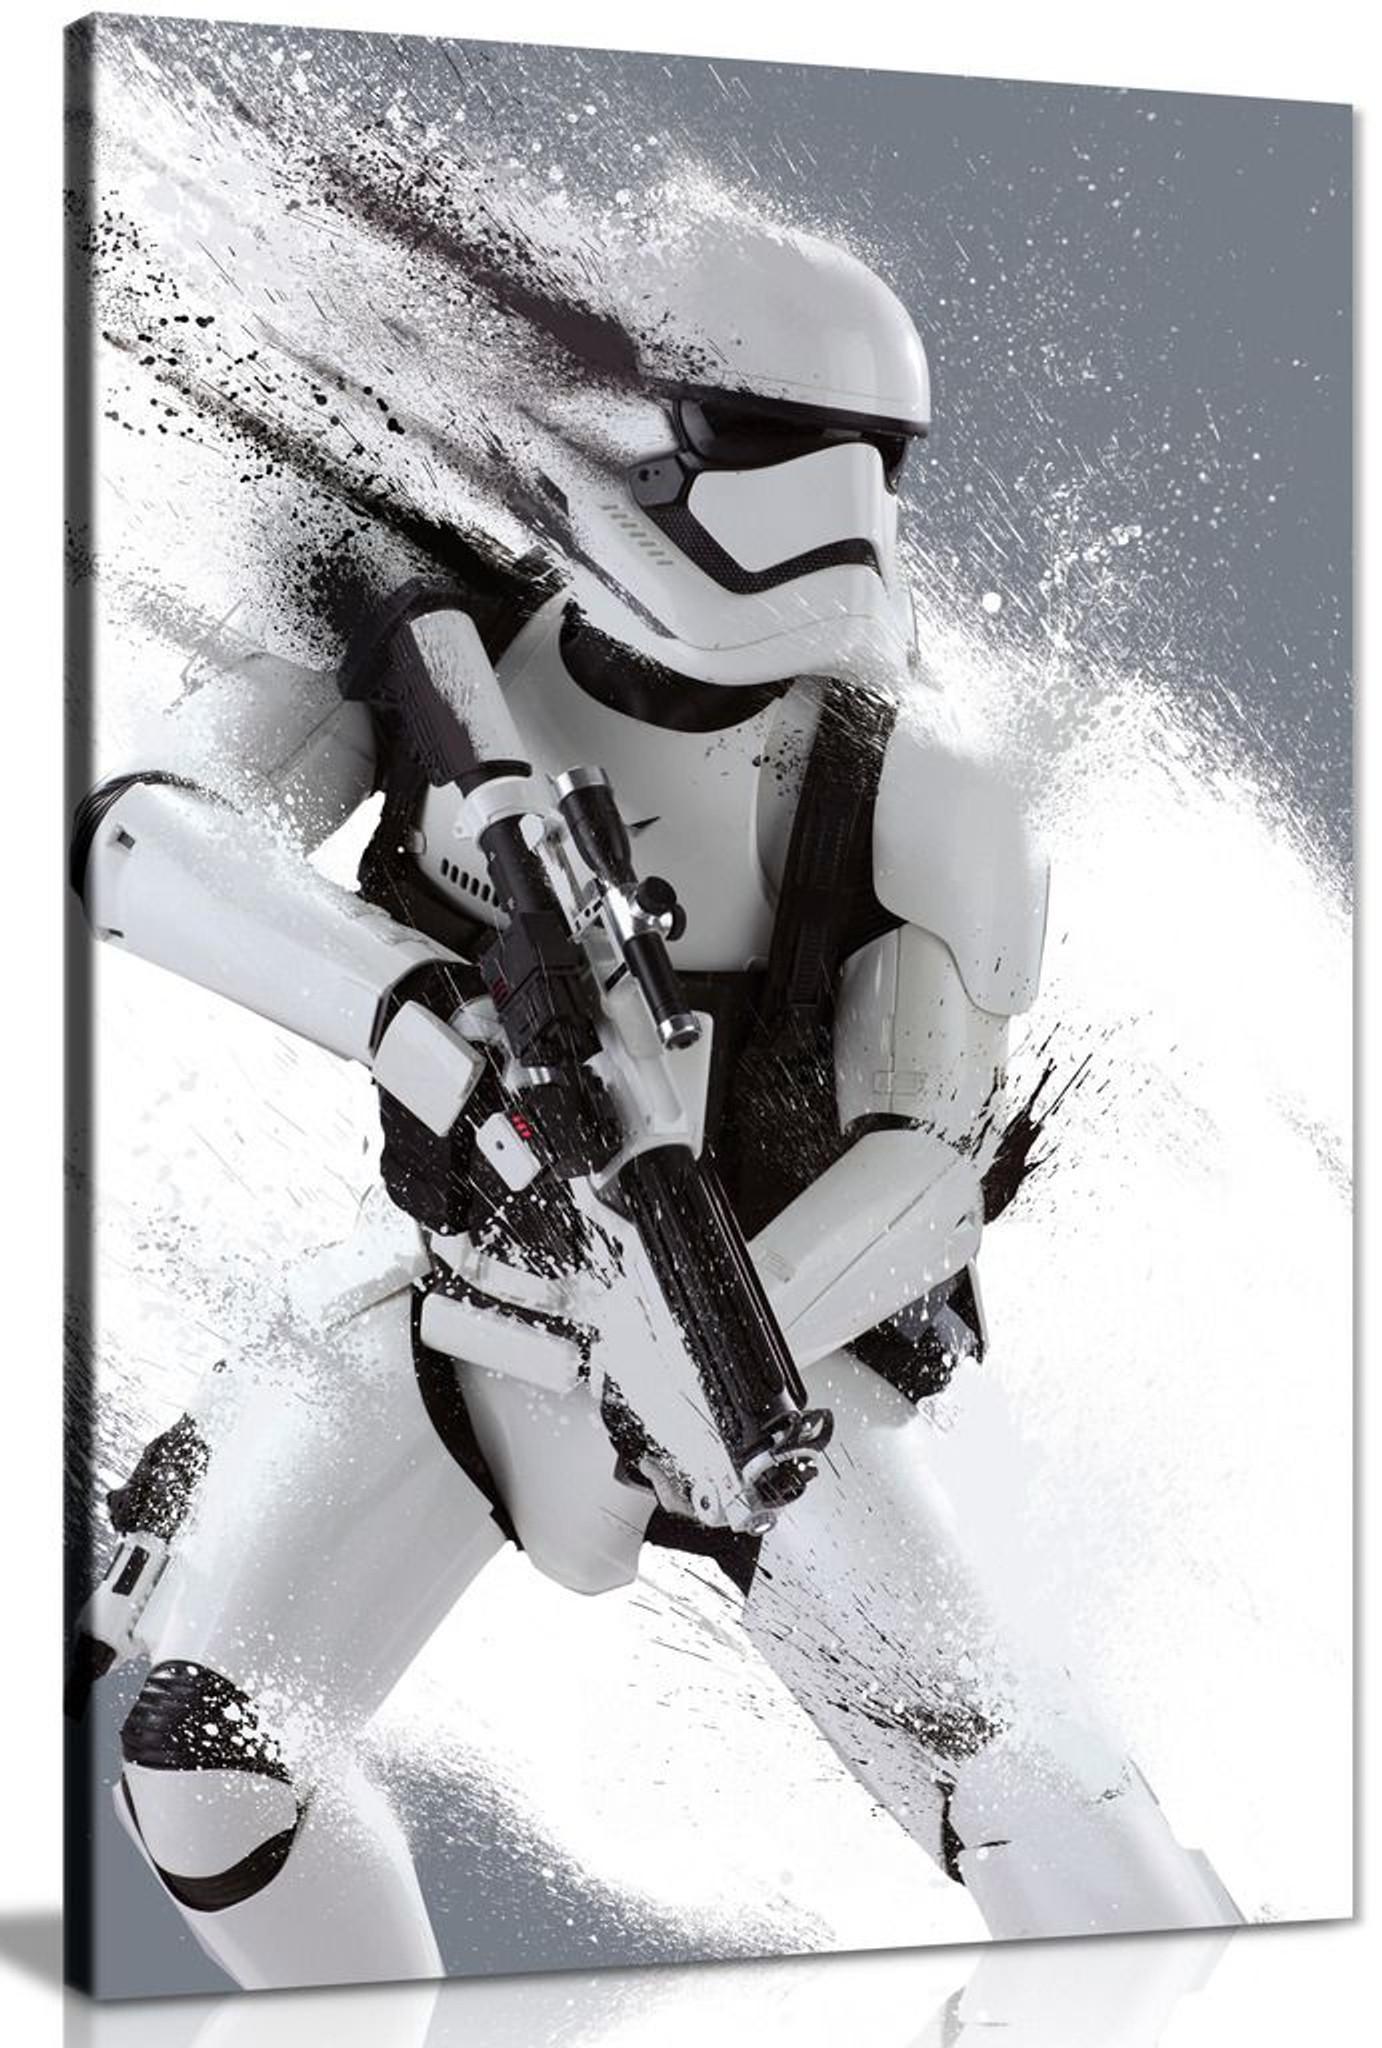 Star Wars Stormtrooper Portrait Black And Whte Canvas